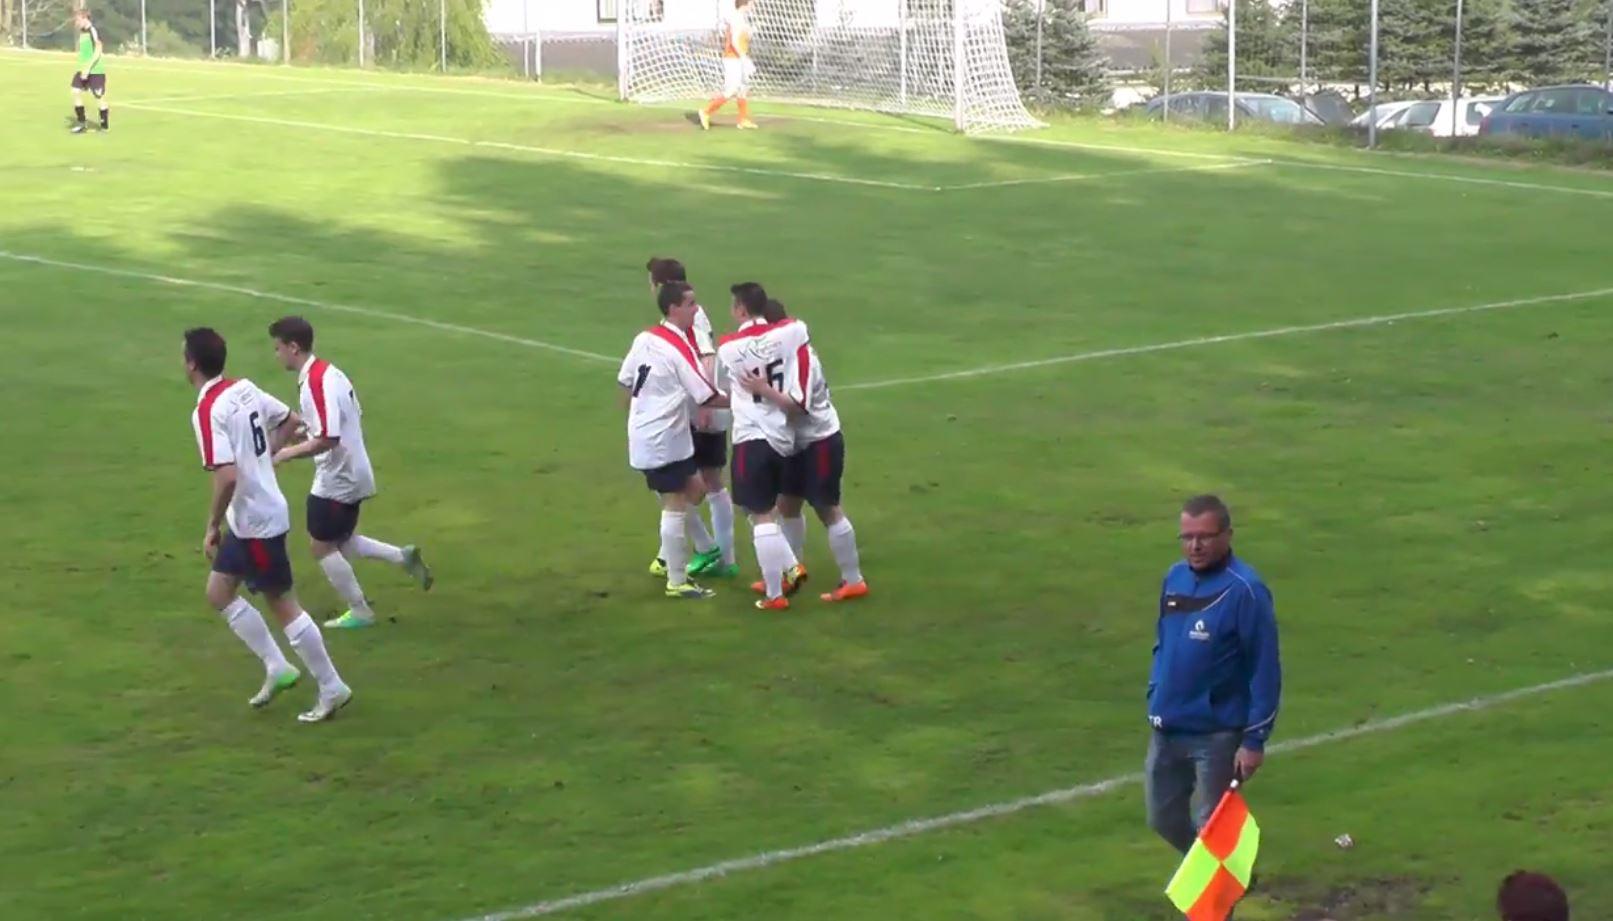 19.04.2014: SG Waldhausen/G. – SV Yspertal 5:1